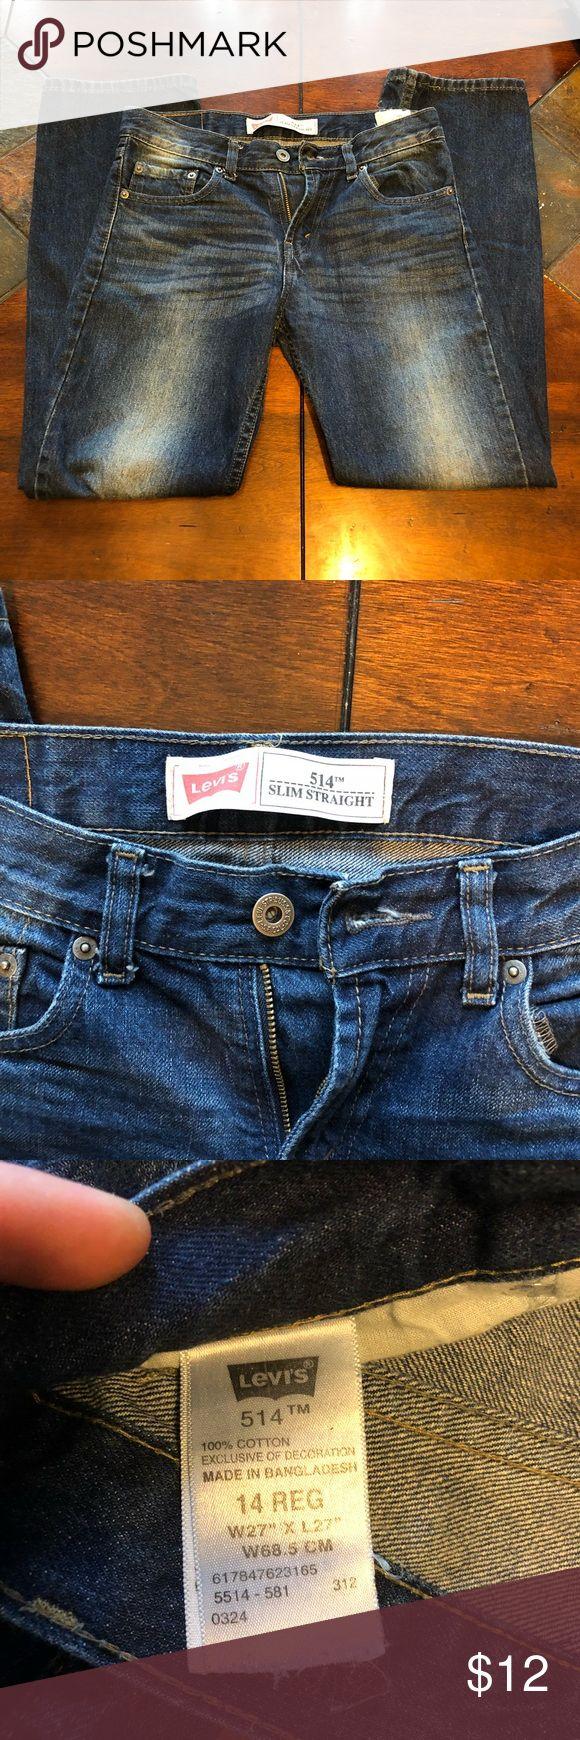 Levi's Women's Slim Straight 514. Great Condition